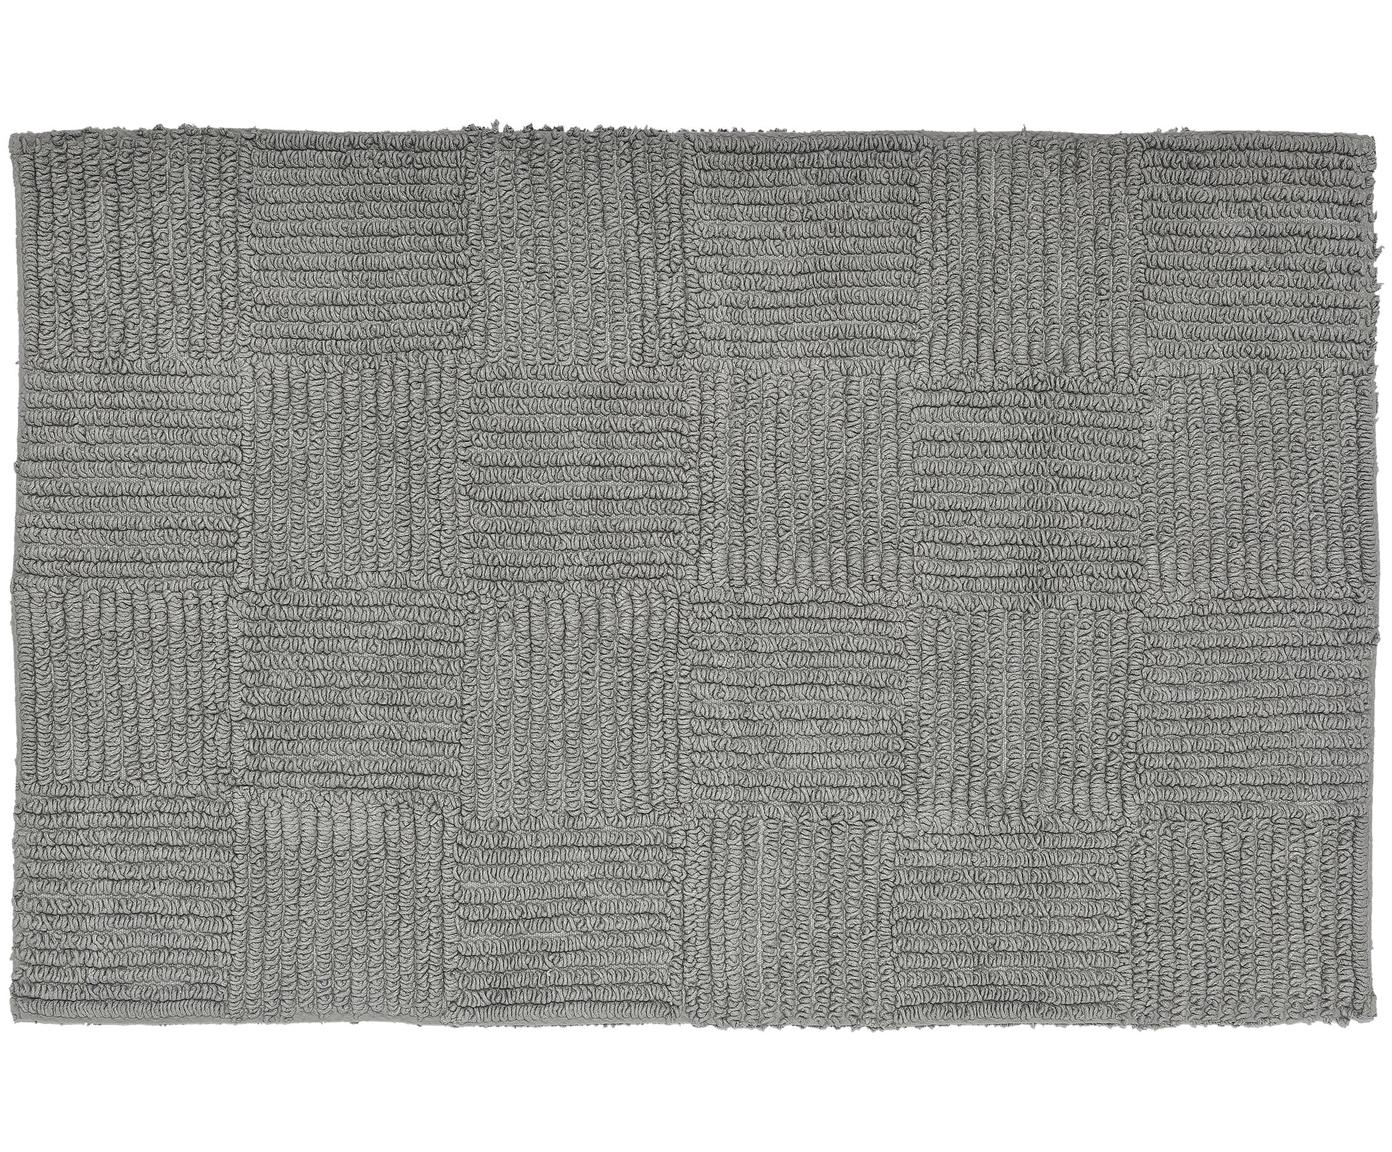 Badmat Sienna, Katoen, Grijs, 60 x 90 cm